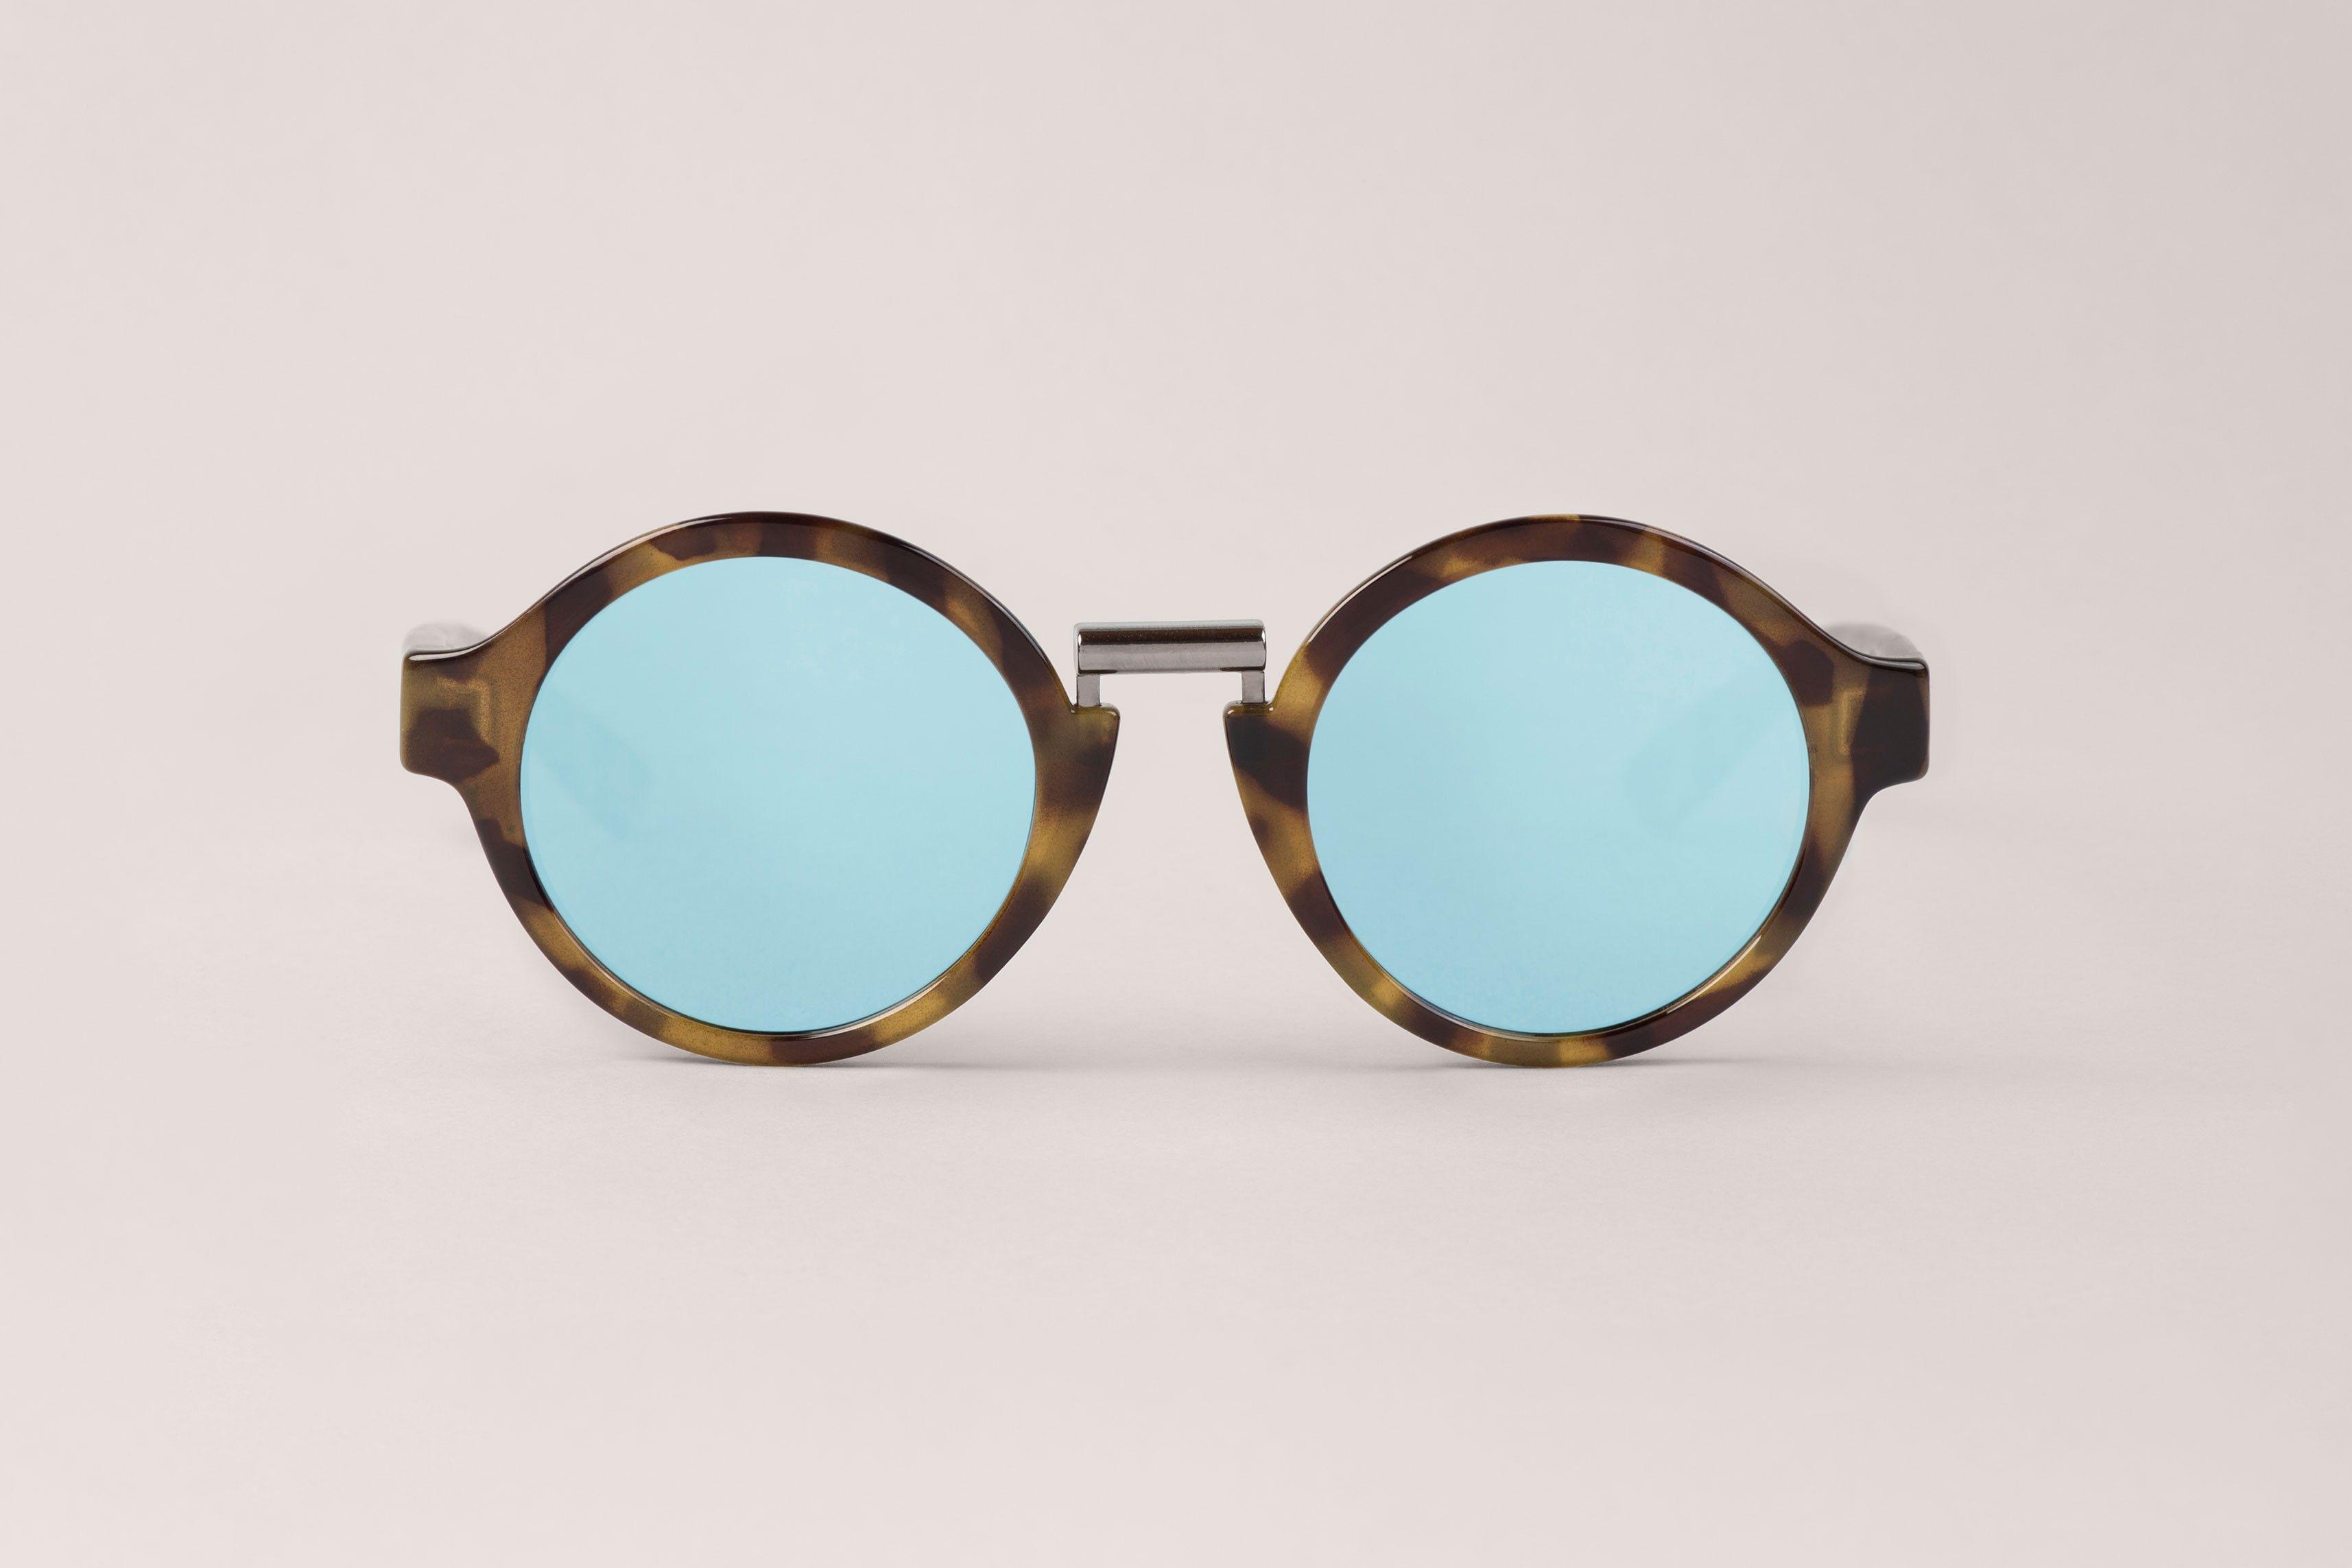 High Contrast Hackney with sky blue lenses - Hackney - Sunglasses | Mr. Boho